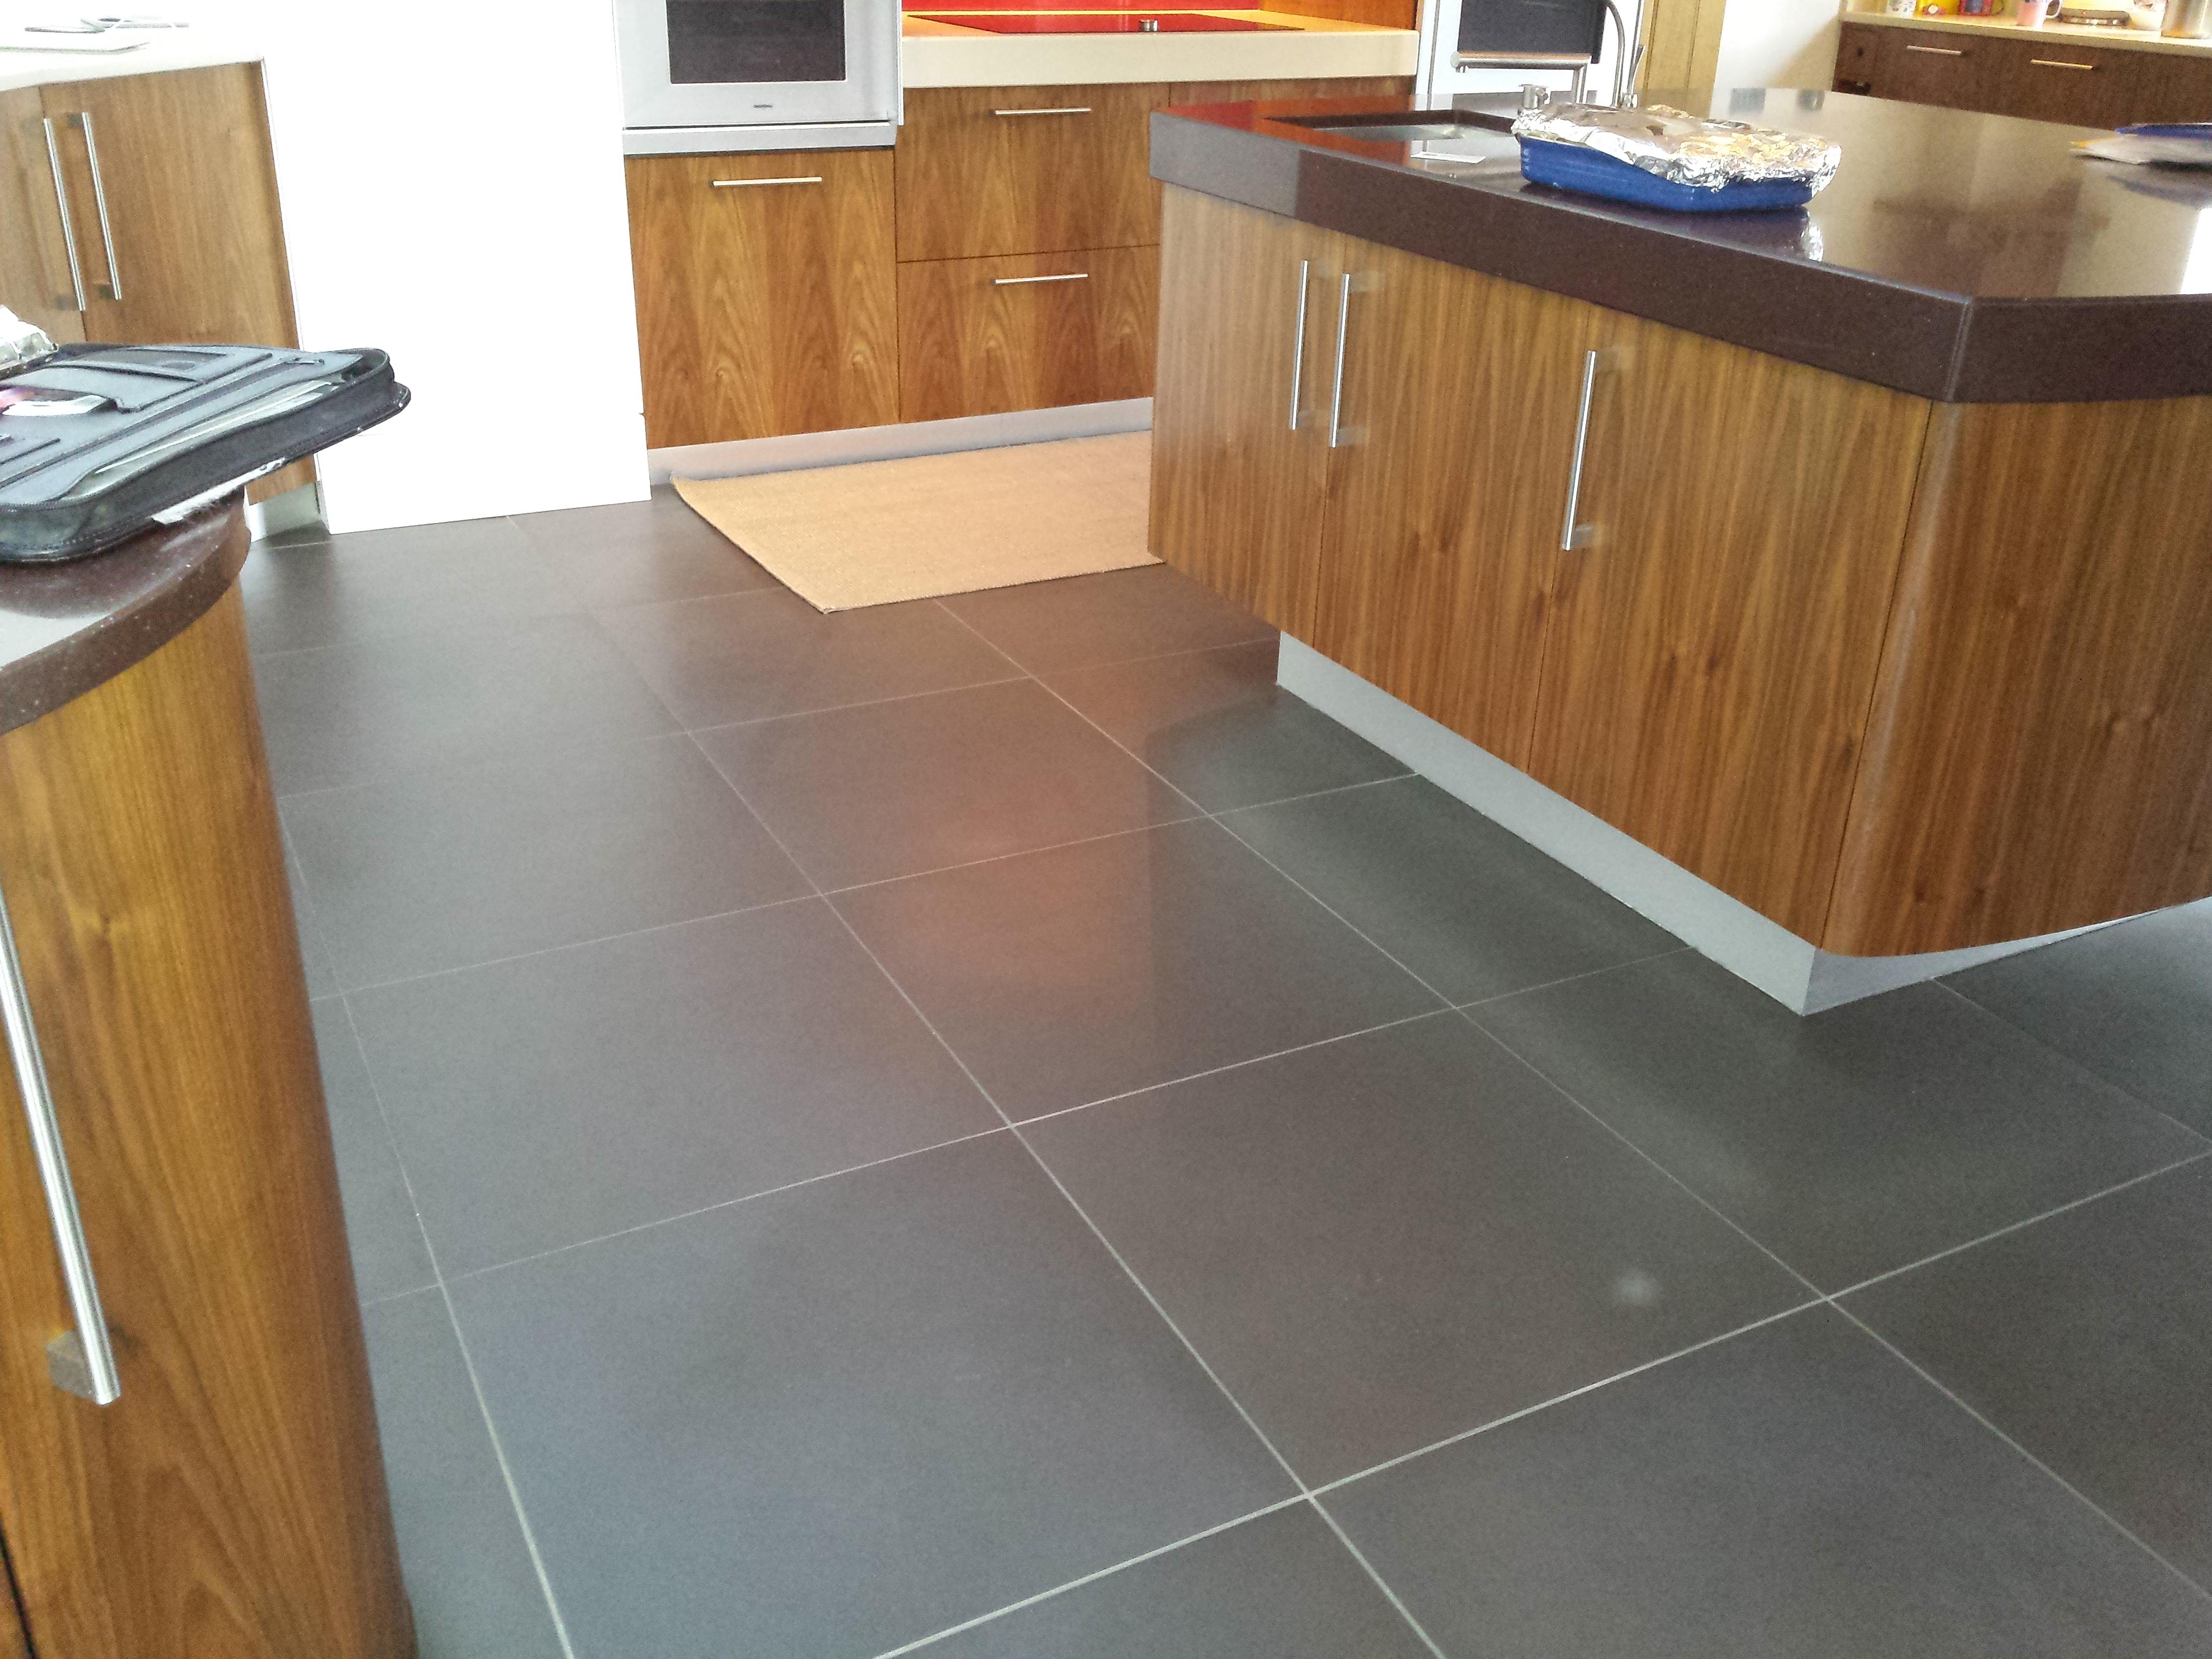 indoor brown living prod novabell tile room product floor stoneware floors porcelain crossover